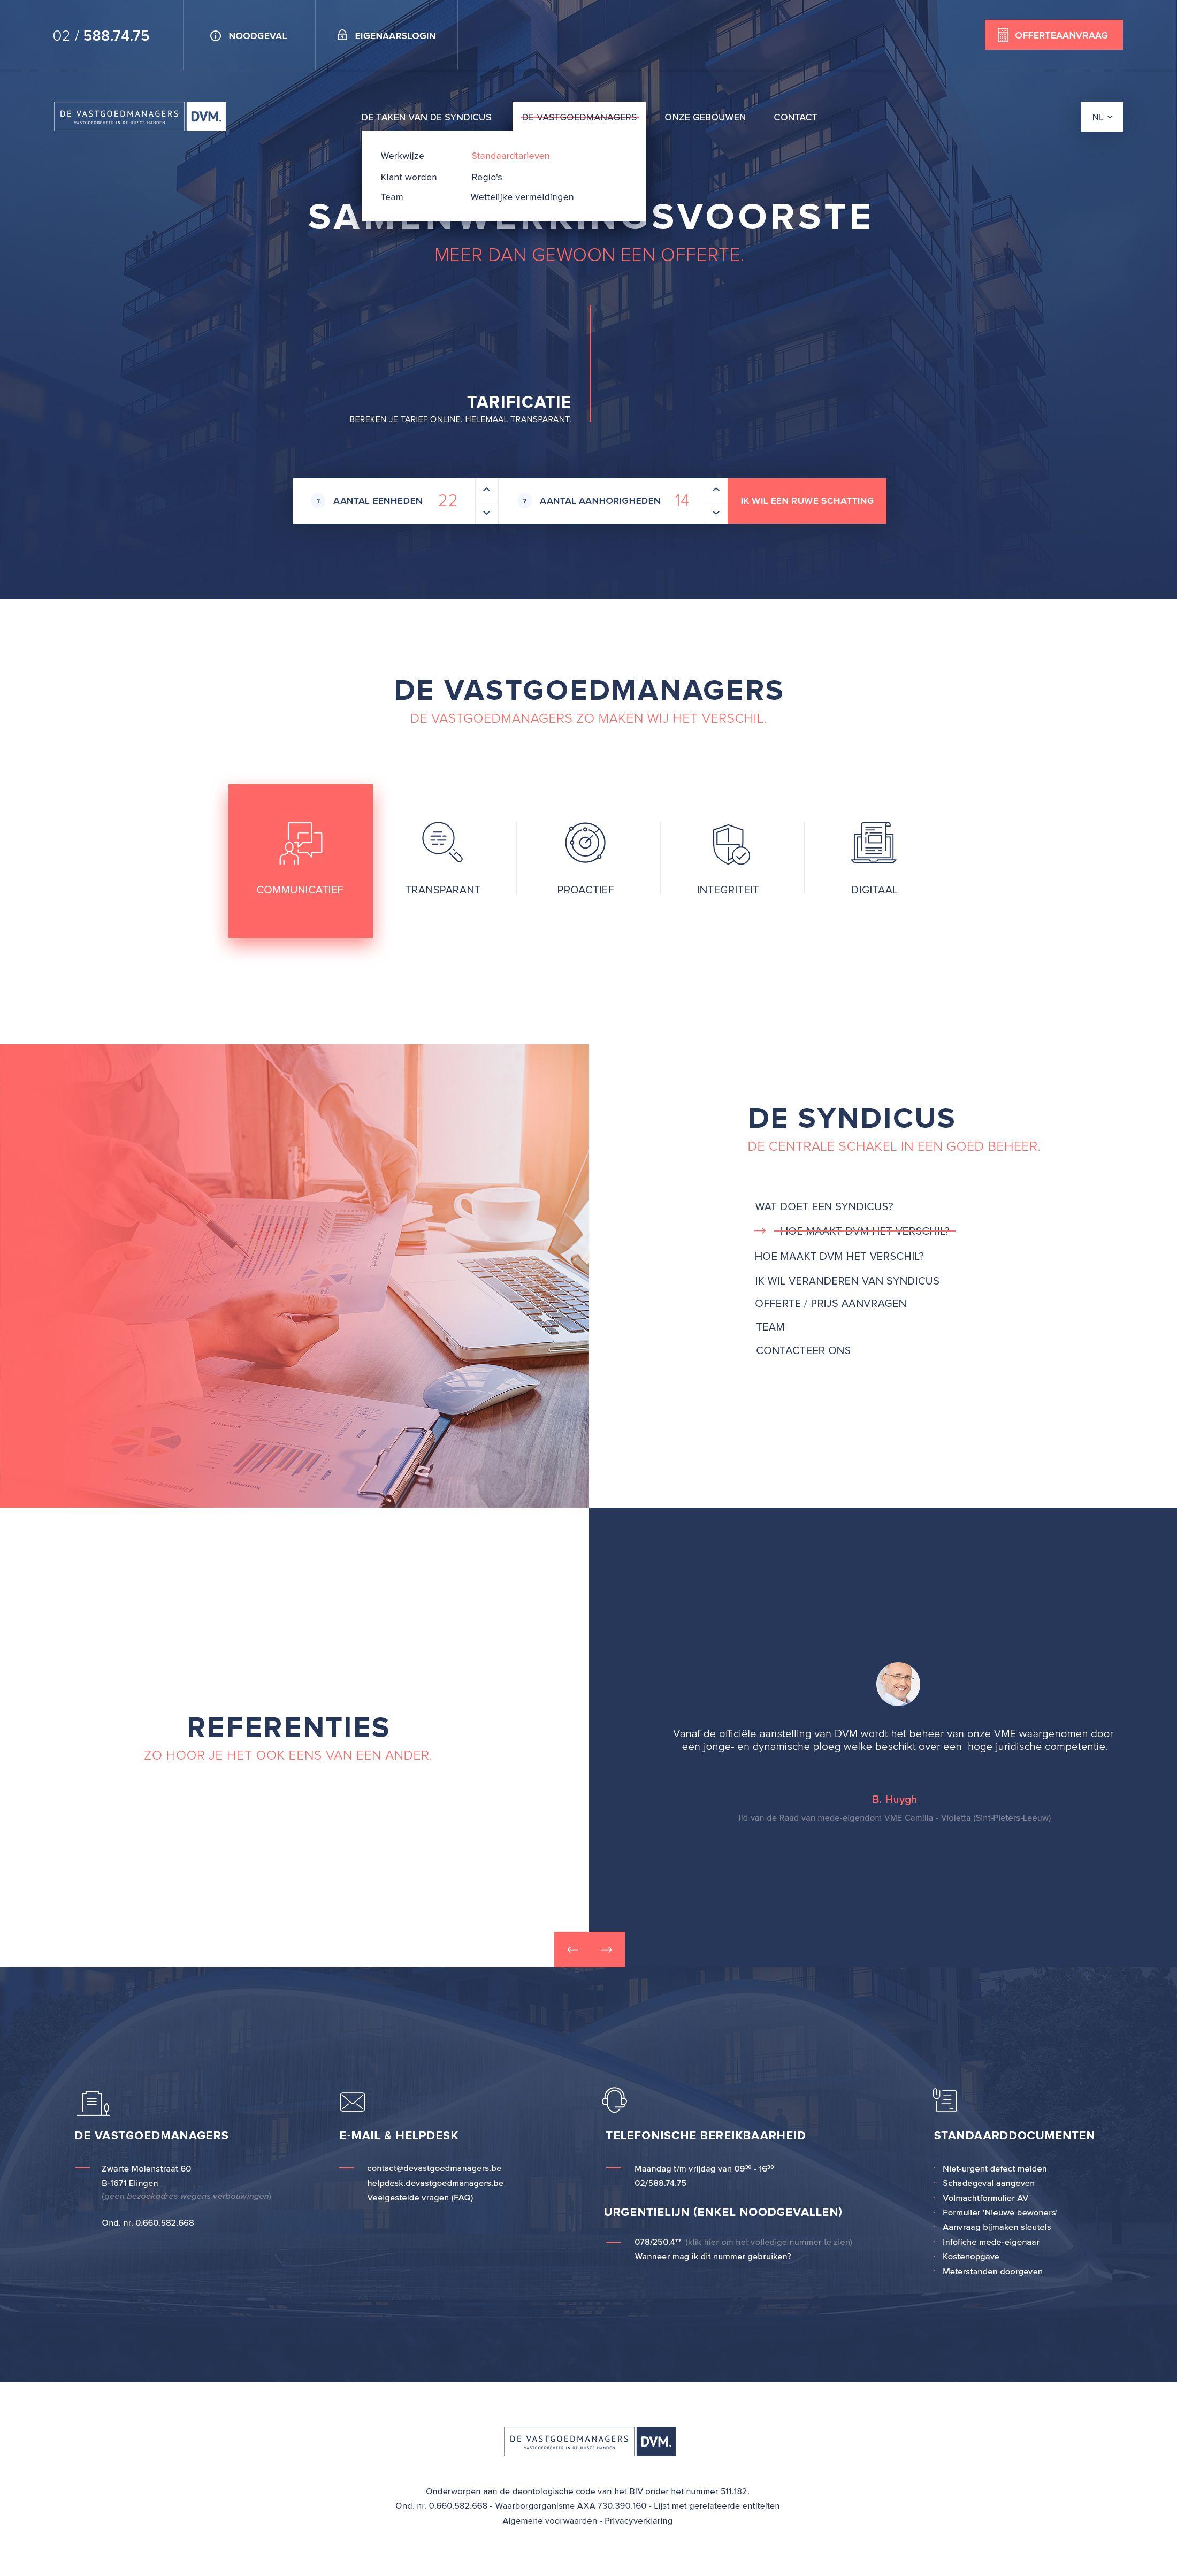 Dvm Homepage 03 08 2018 Dropdown Menu Web Layout Design Ux Web Design Web Design